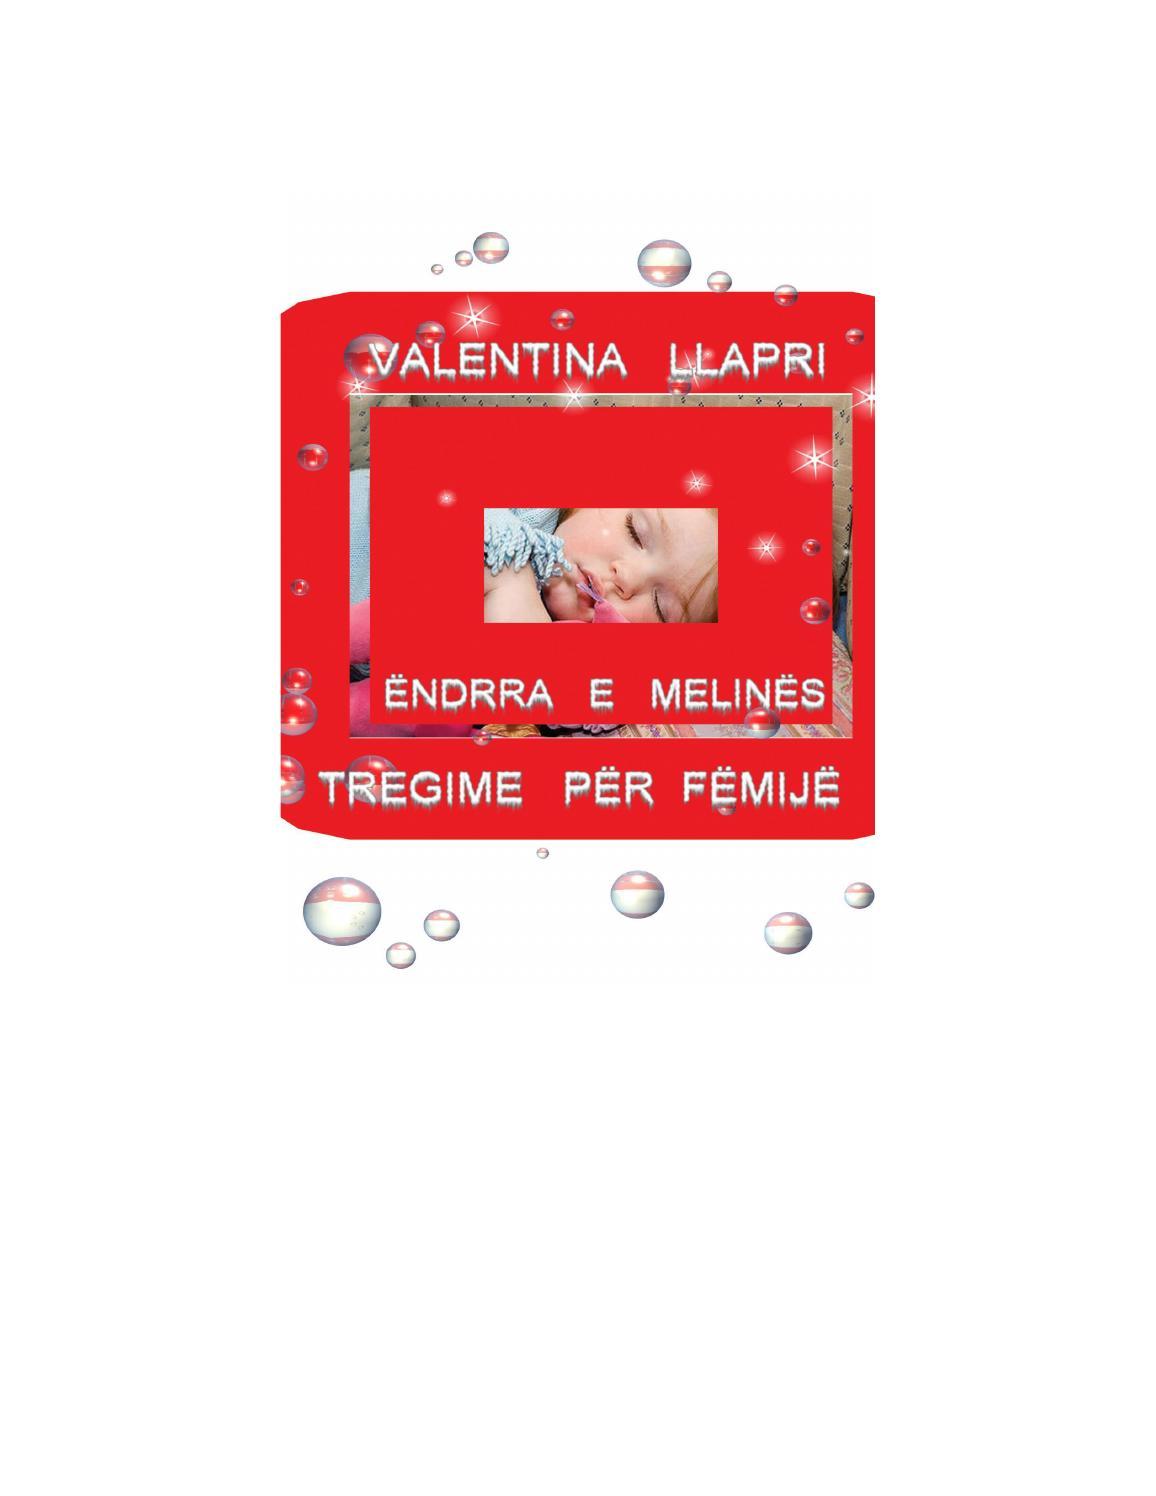 Endrra E Melines Tregime Per Femije By Valentina Llapri Issuu